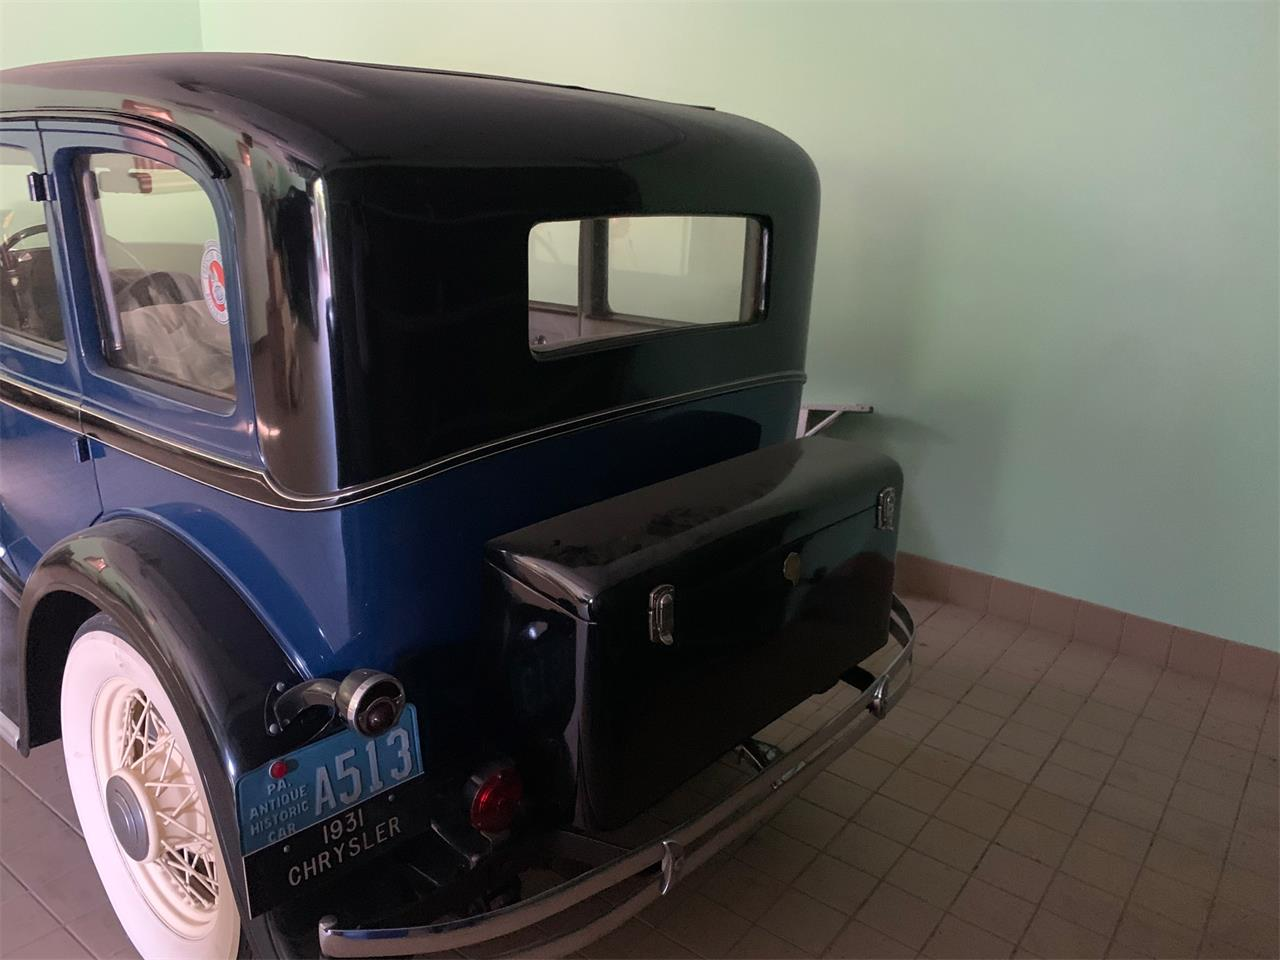 1931 Chrysler 4-Dr Sedan (CC-1380134) for sale in Moosic, Pennsylvania